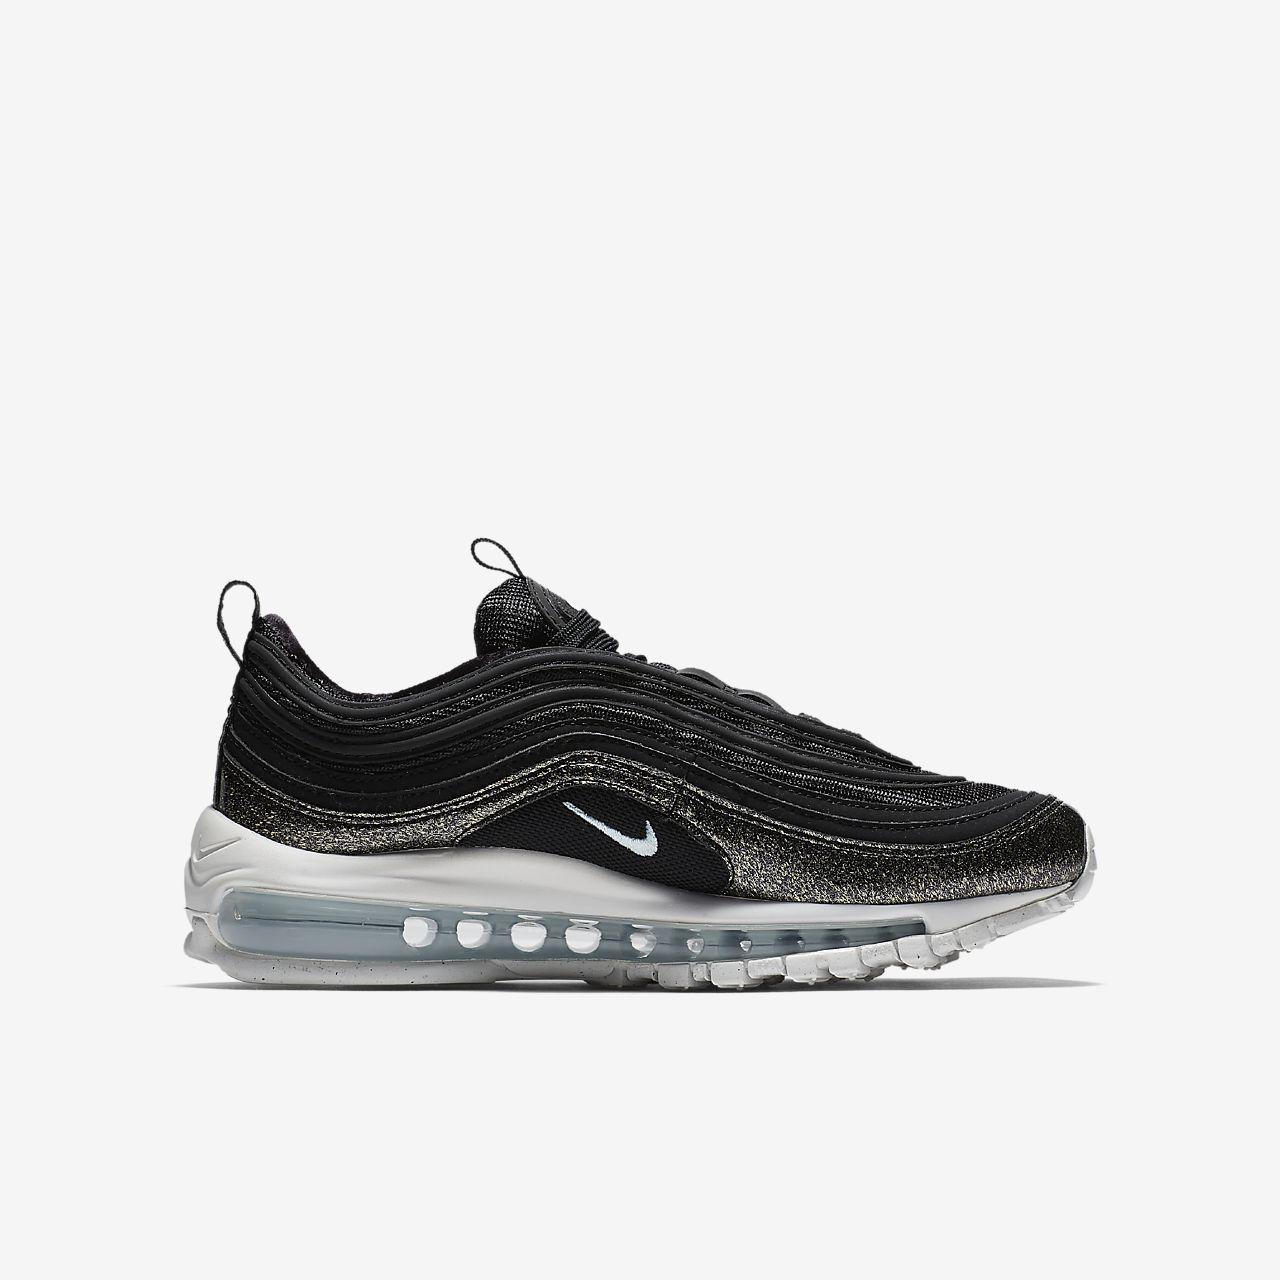 ... Nike Air Max 97 Pinnacle QS Older Kids' Shoe